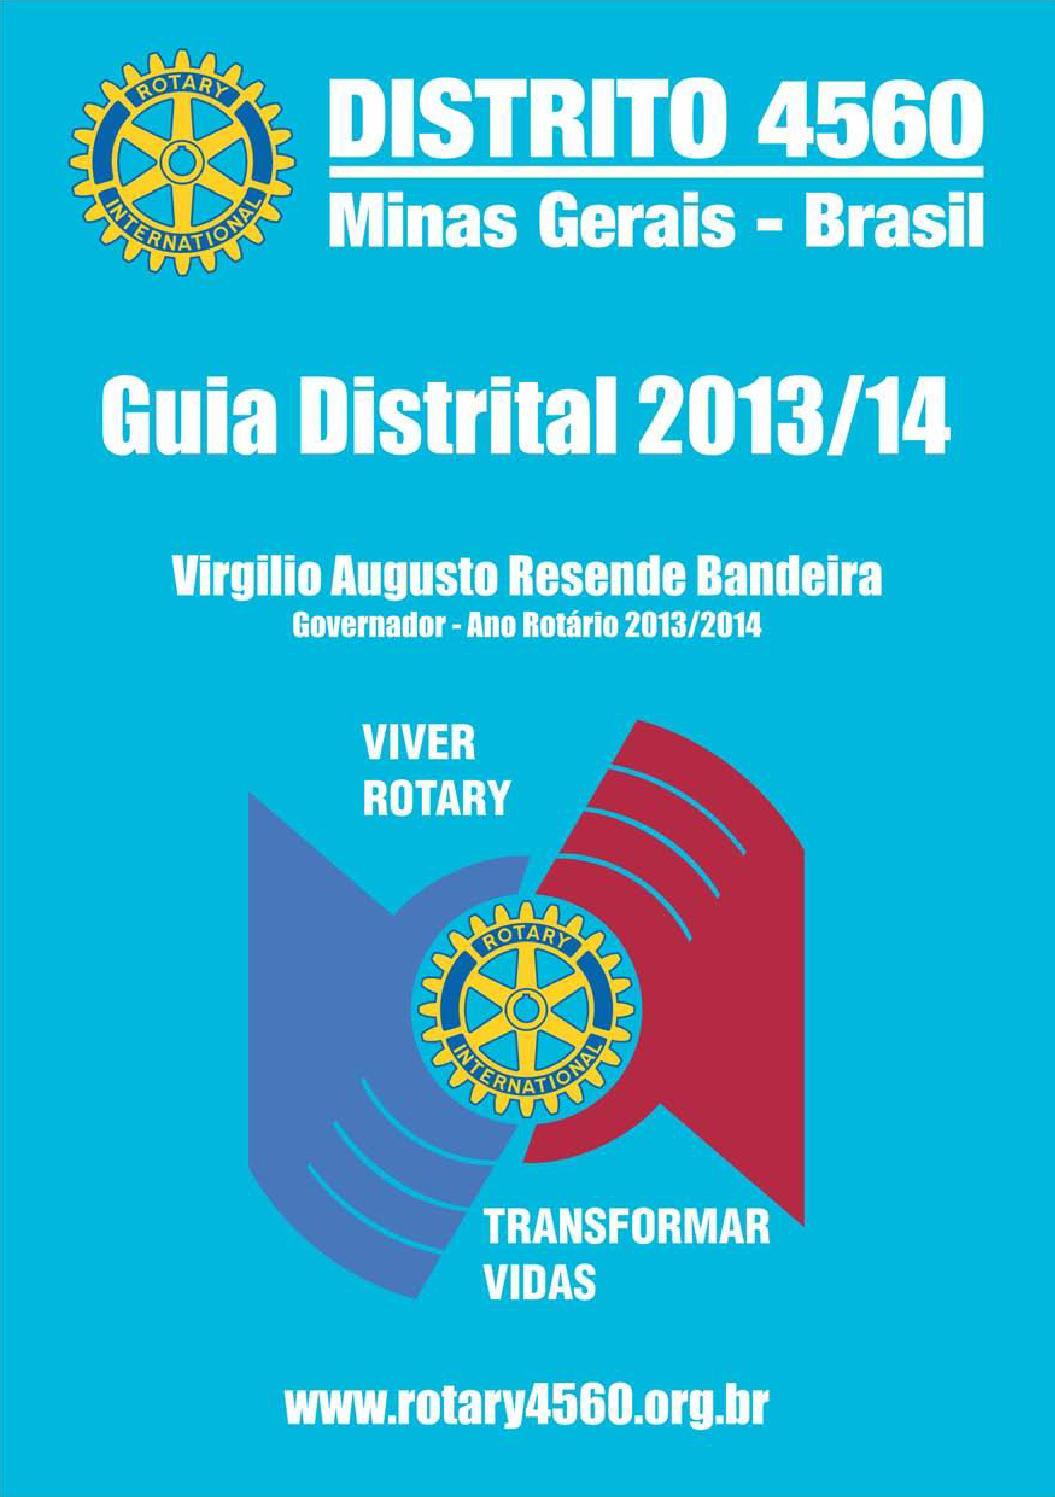 29e0fb8683 Guia Distrital 2013 14 - Distrito 4560 by João Zatti - issuu